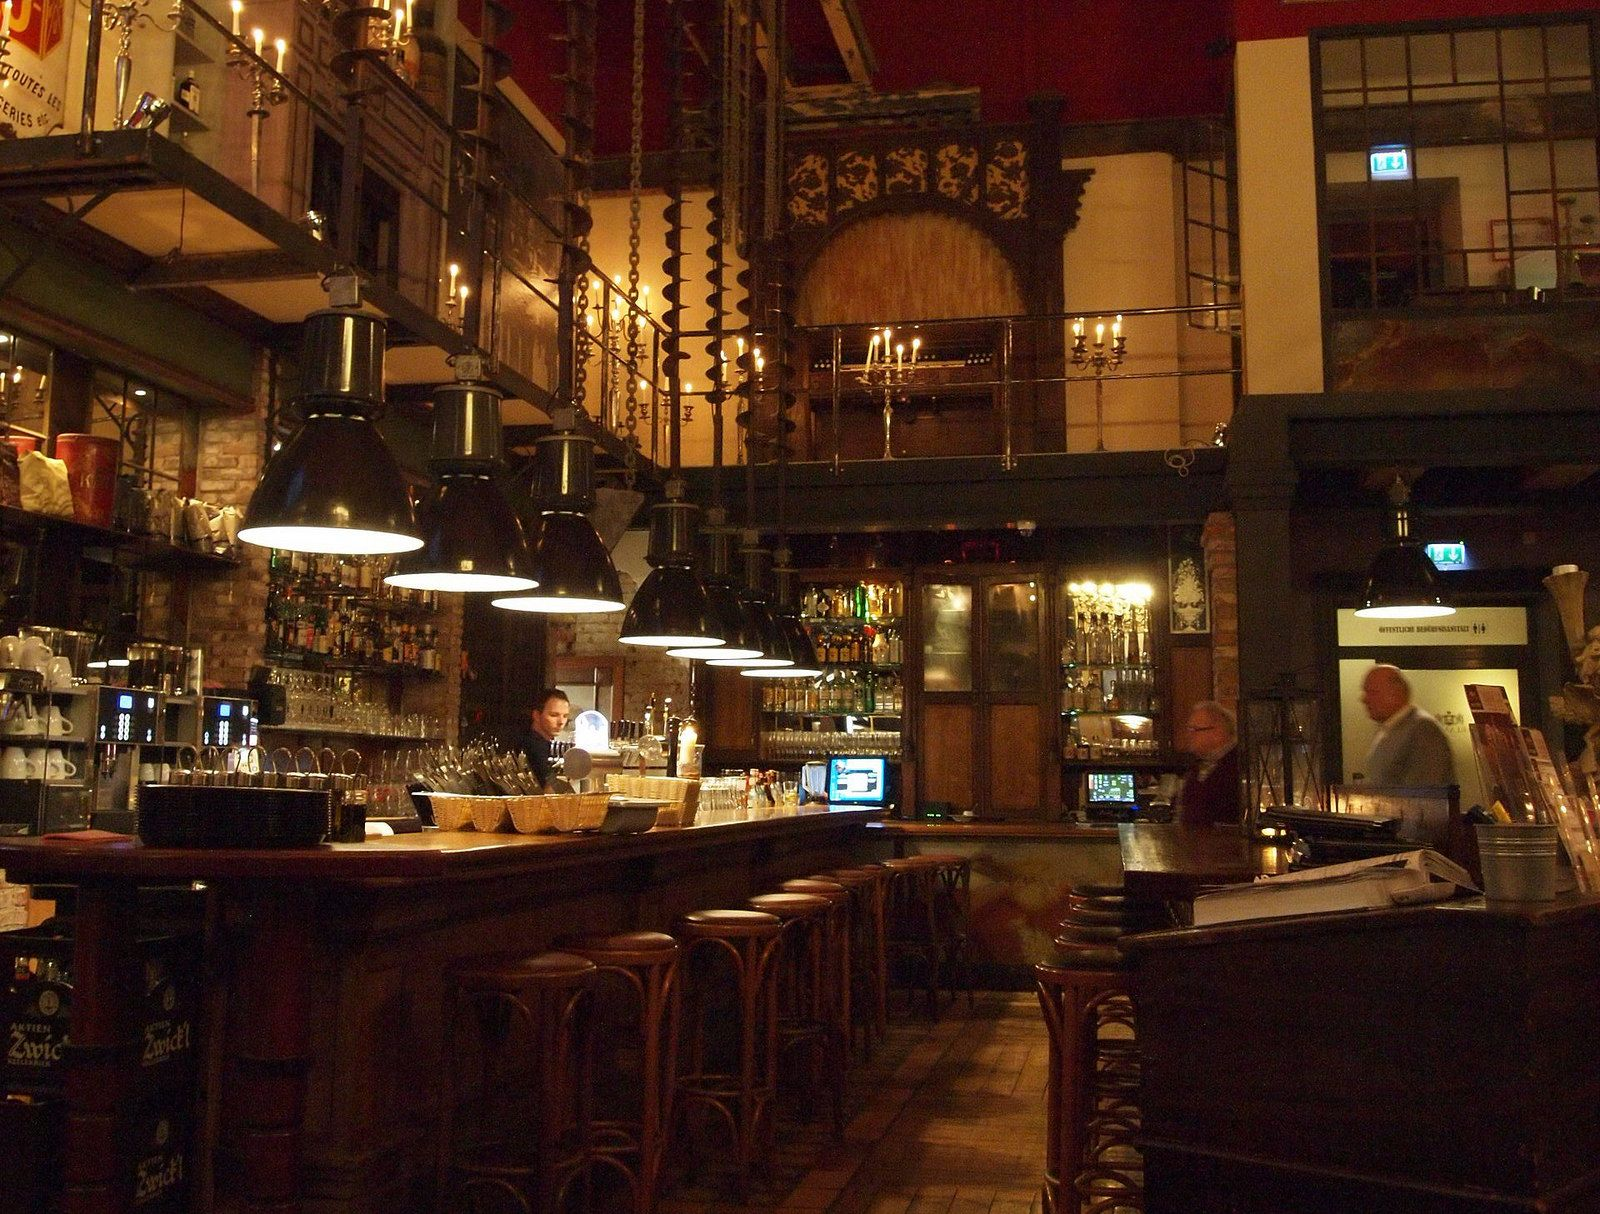 Httpsflickrpjjiuy7 - Parlament 2 - Restaurant